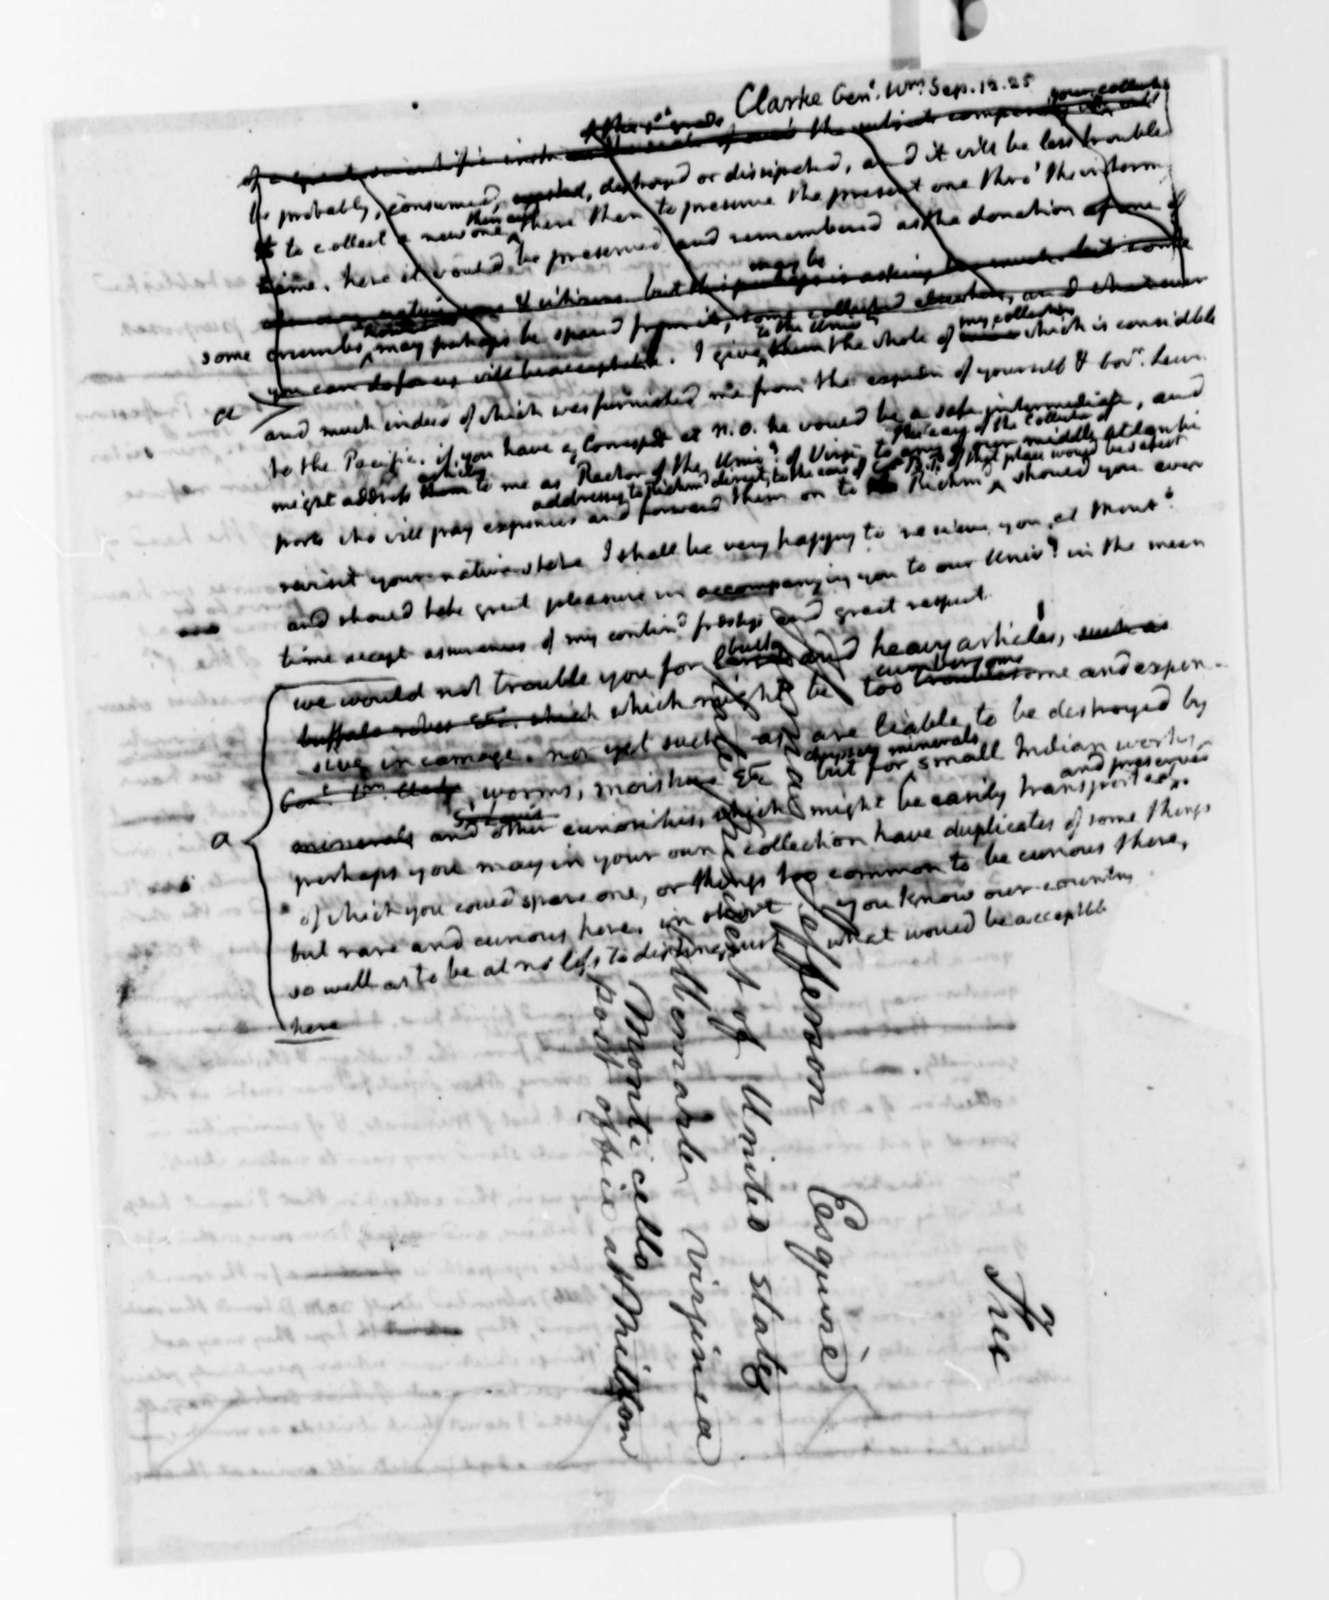 Thomas Jefferson to William Clark, September 12, 1825